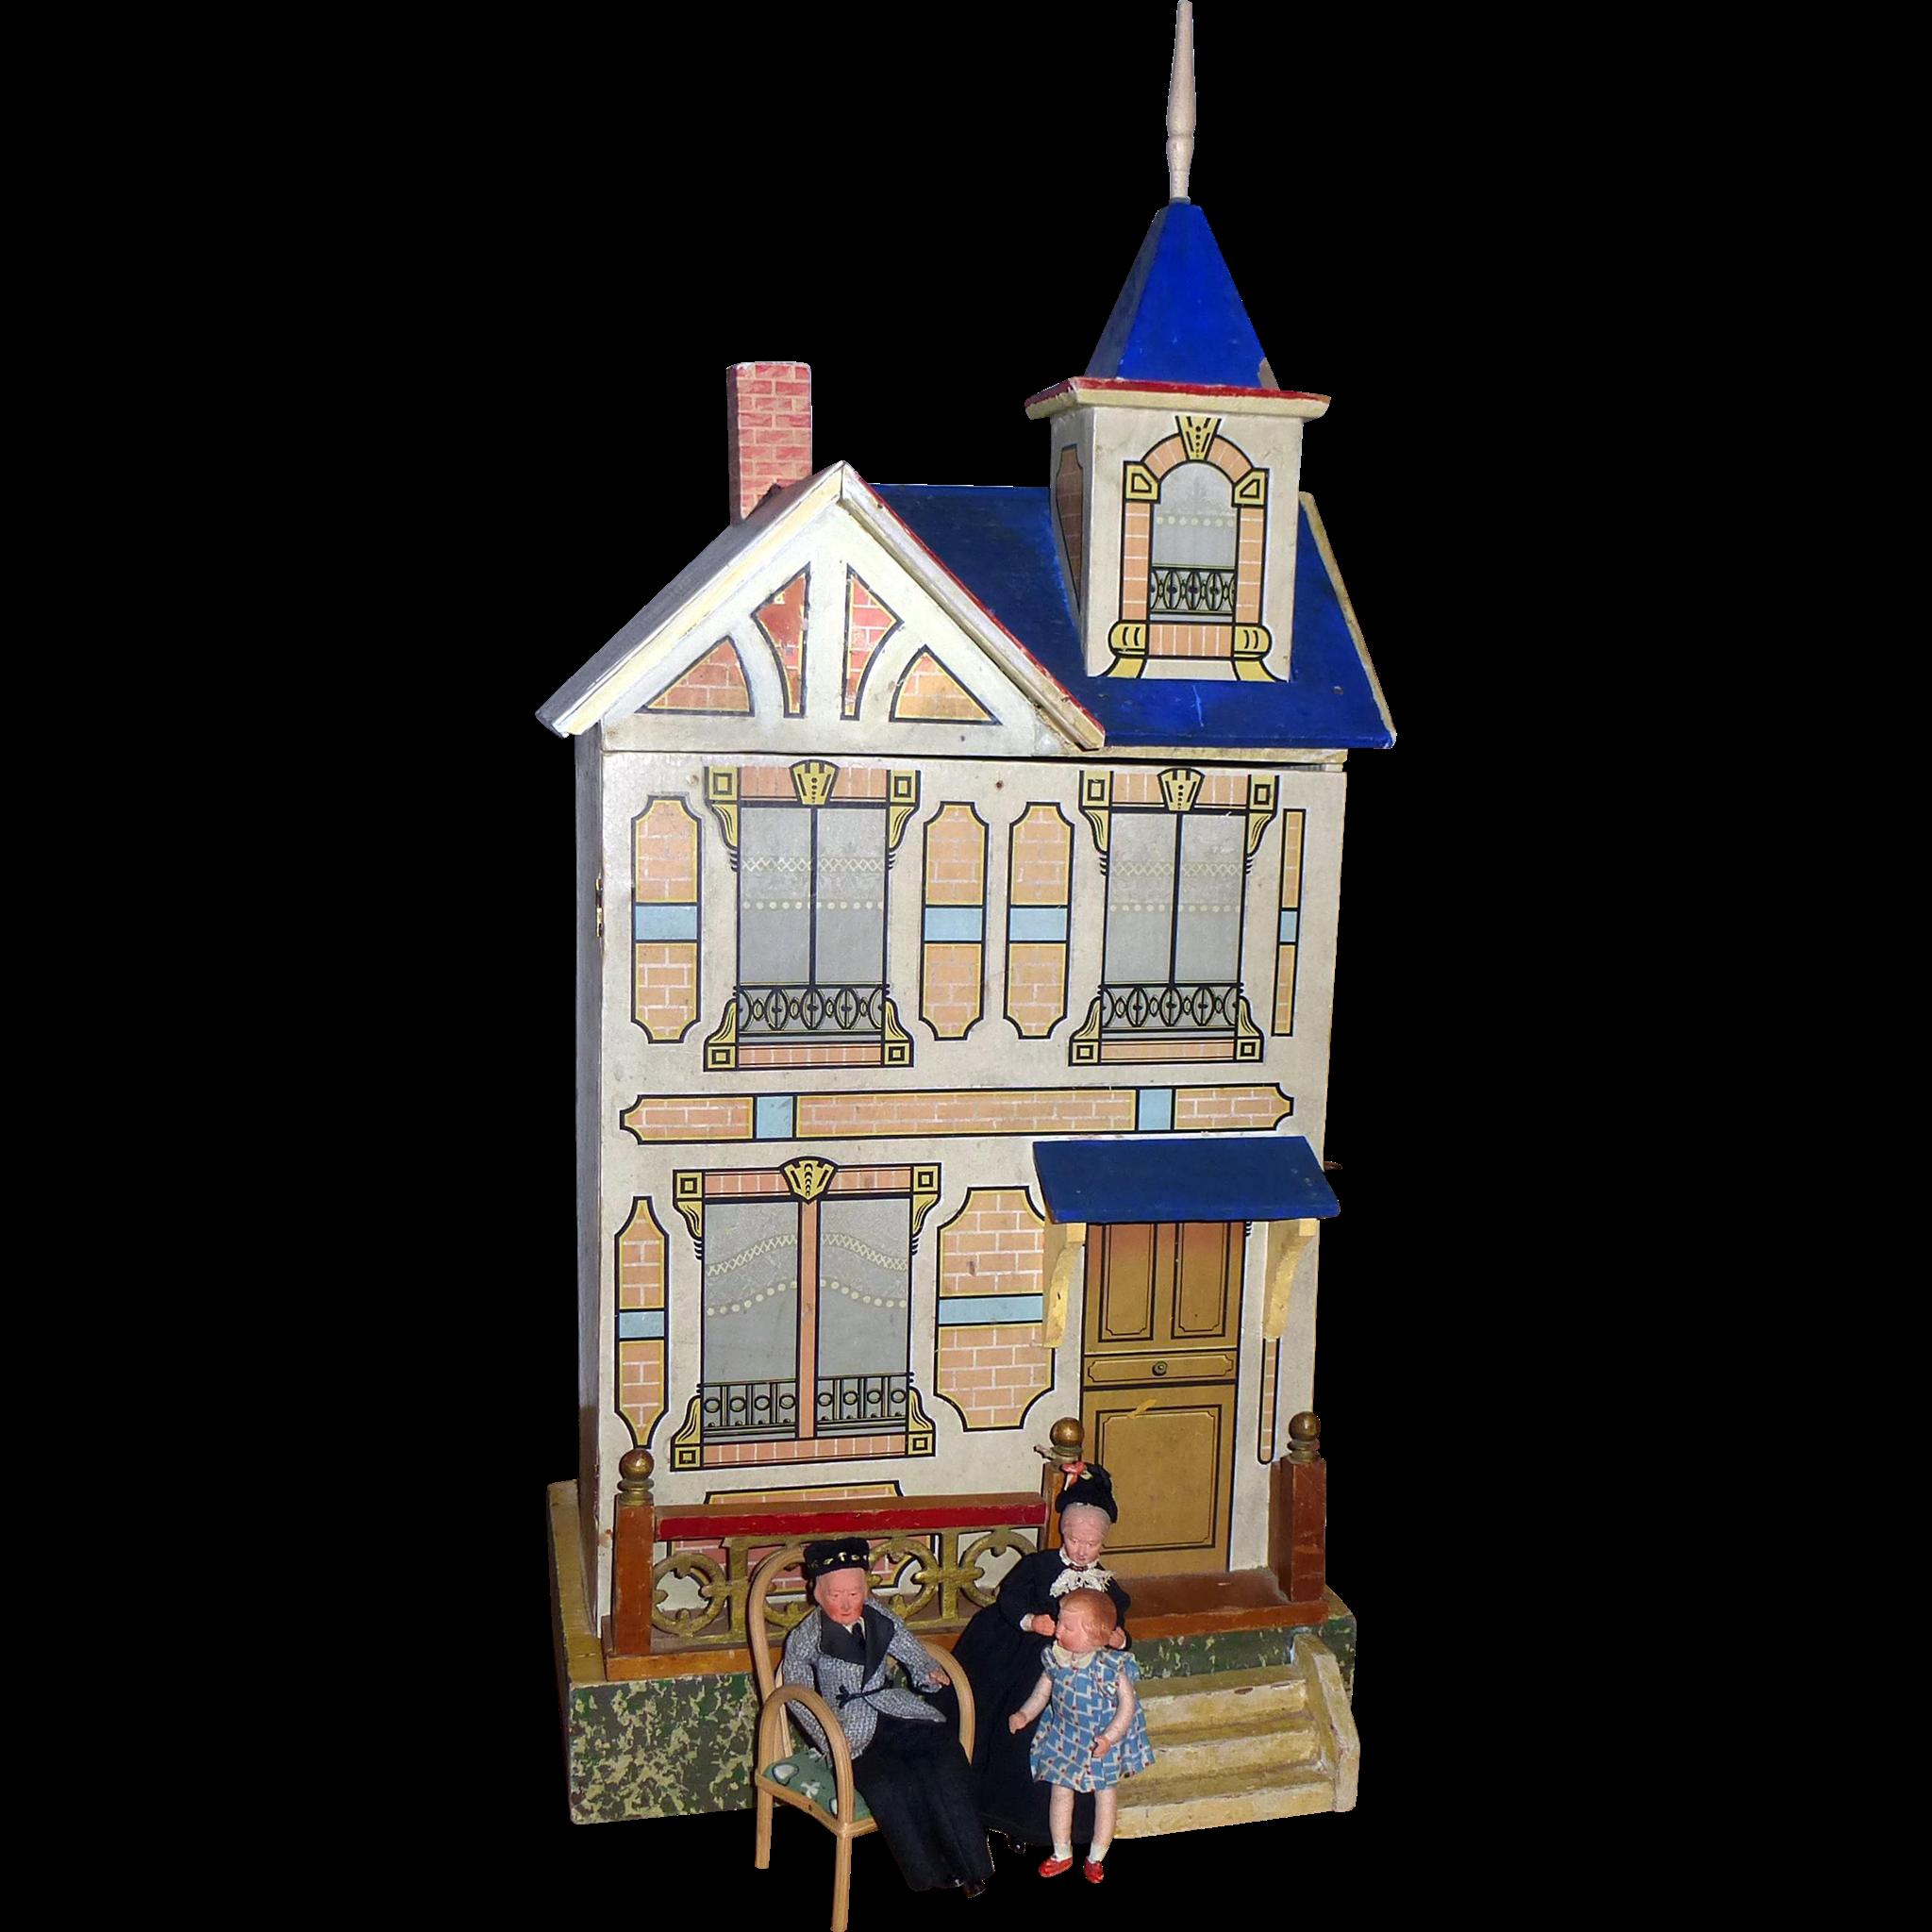 Antique Gottschalk Dollhouse Blue Roof From Luisa27 On